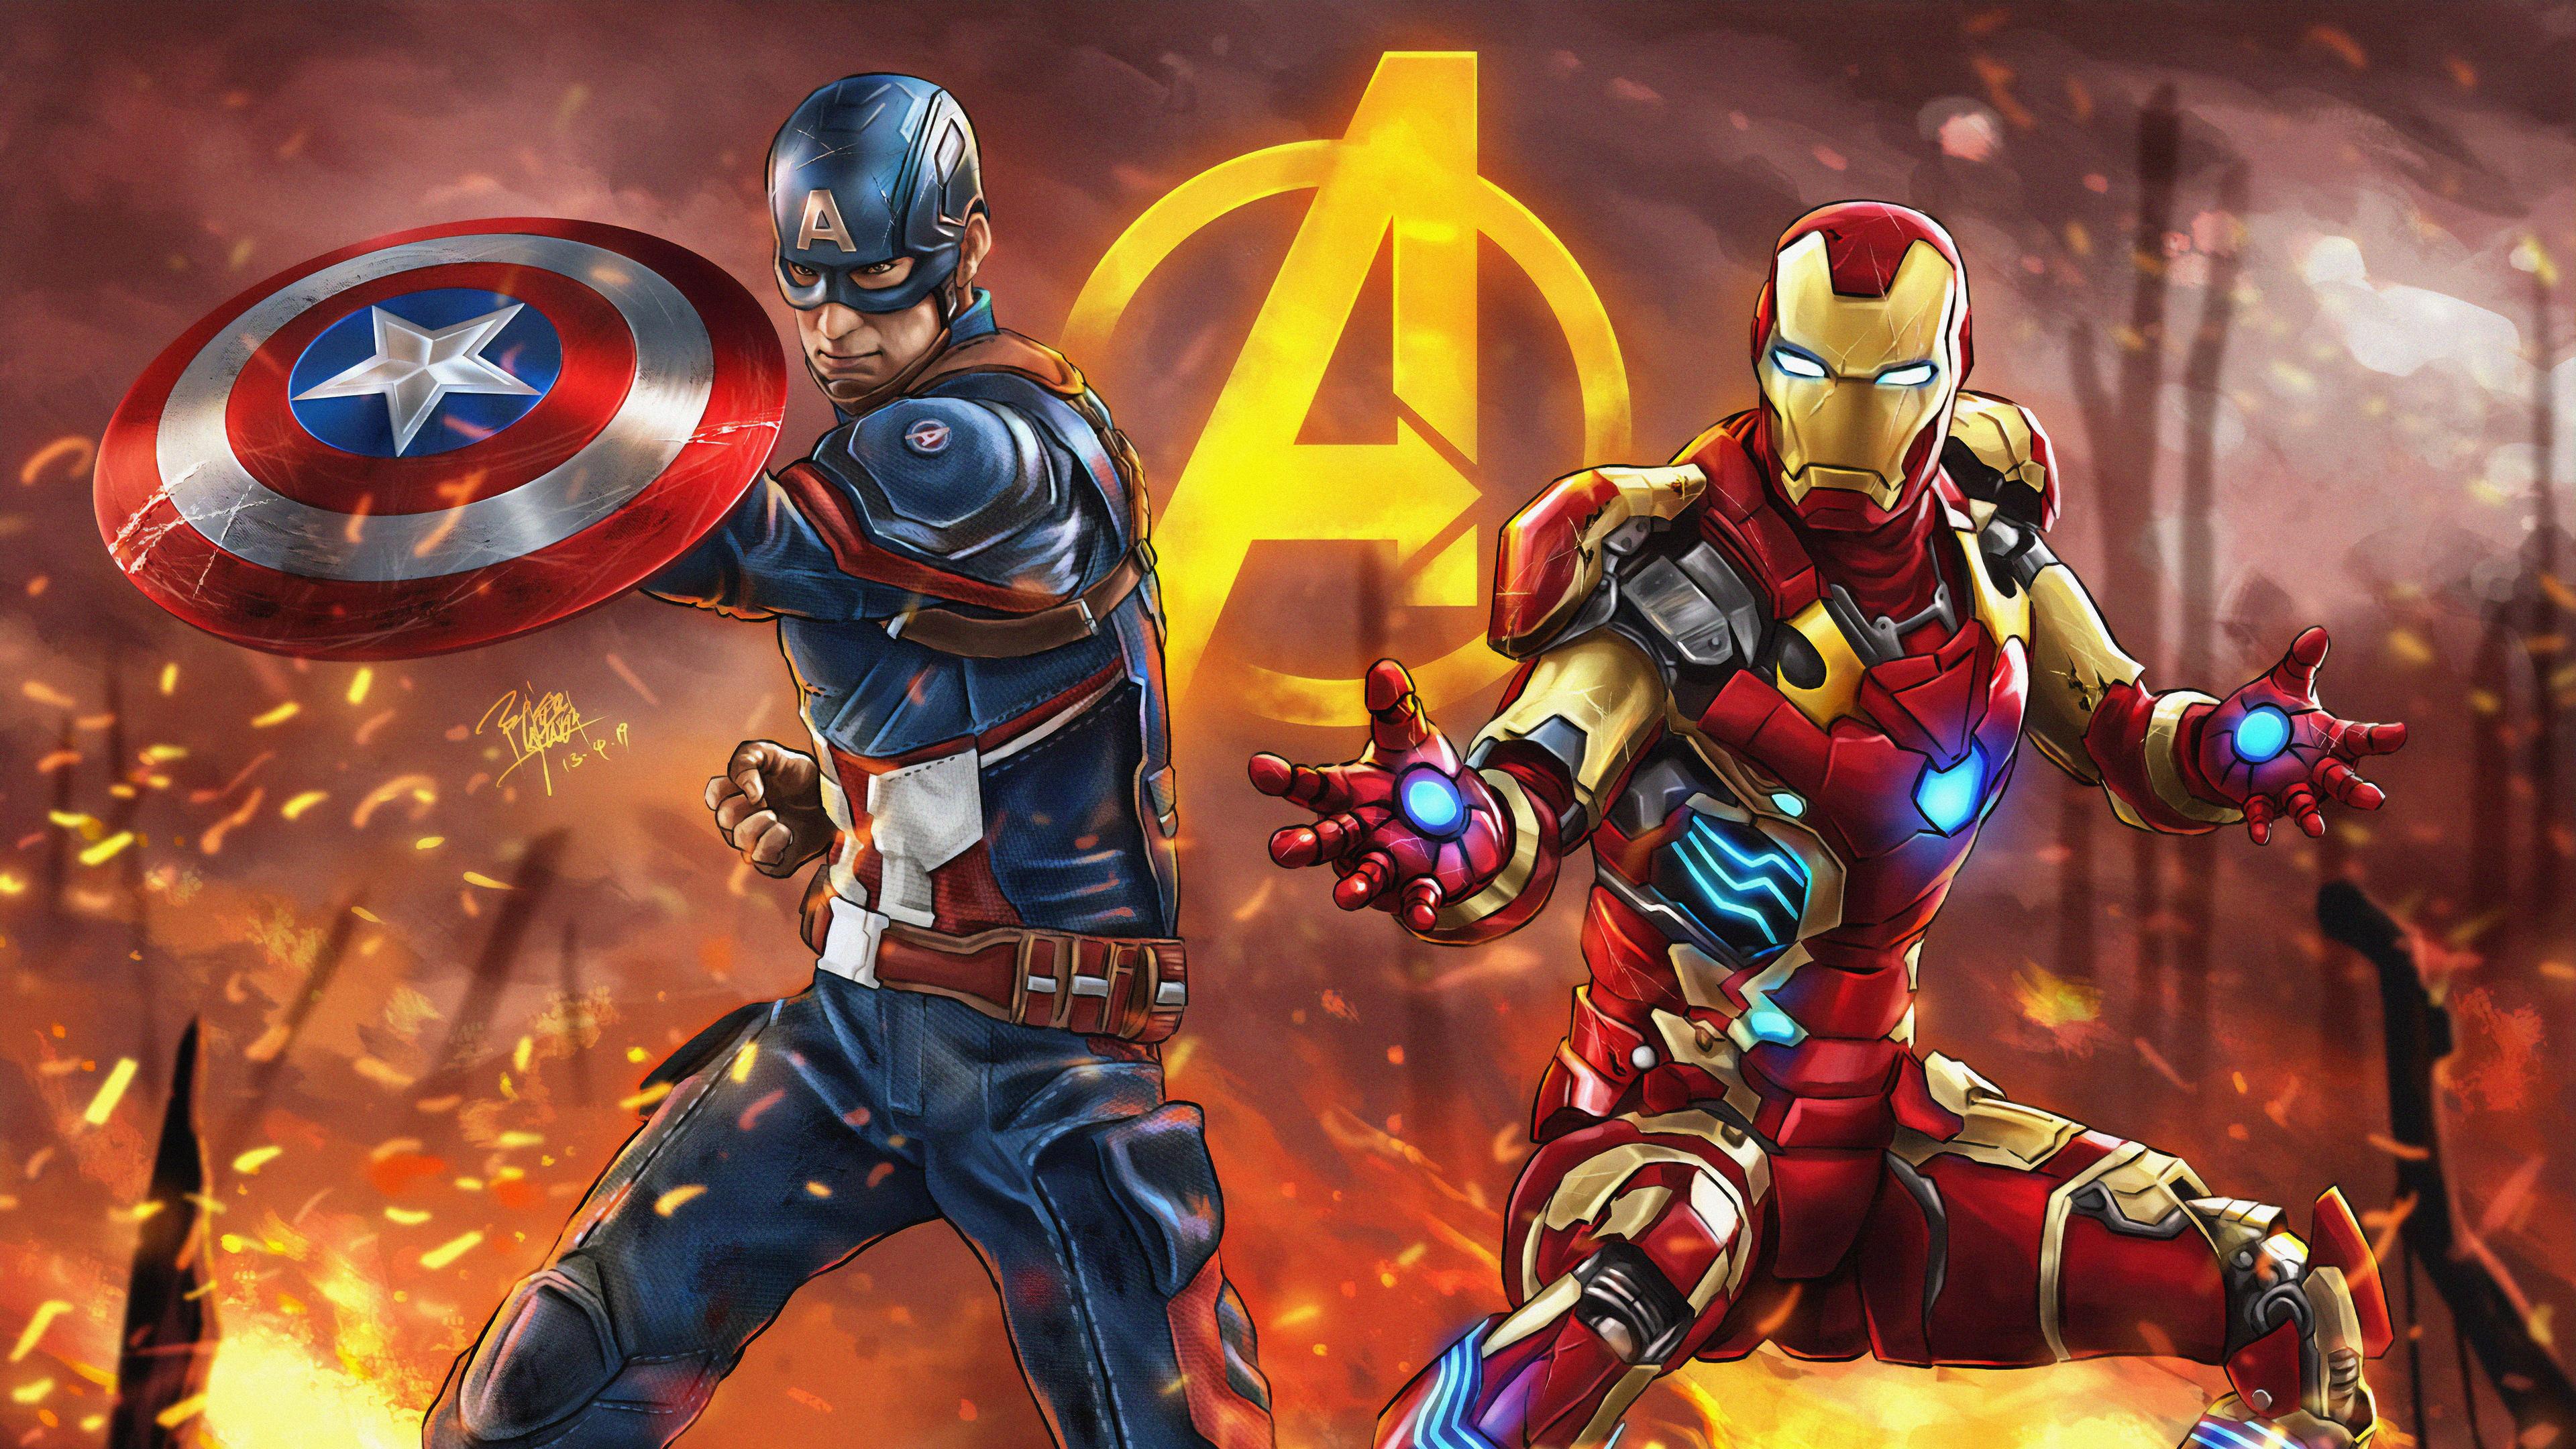 captain-america-and-iron-man-4k-d1.jpg